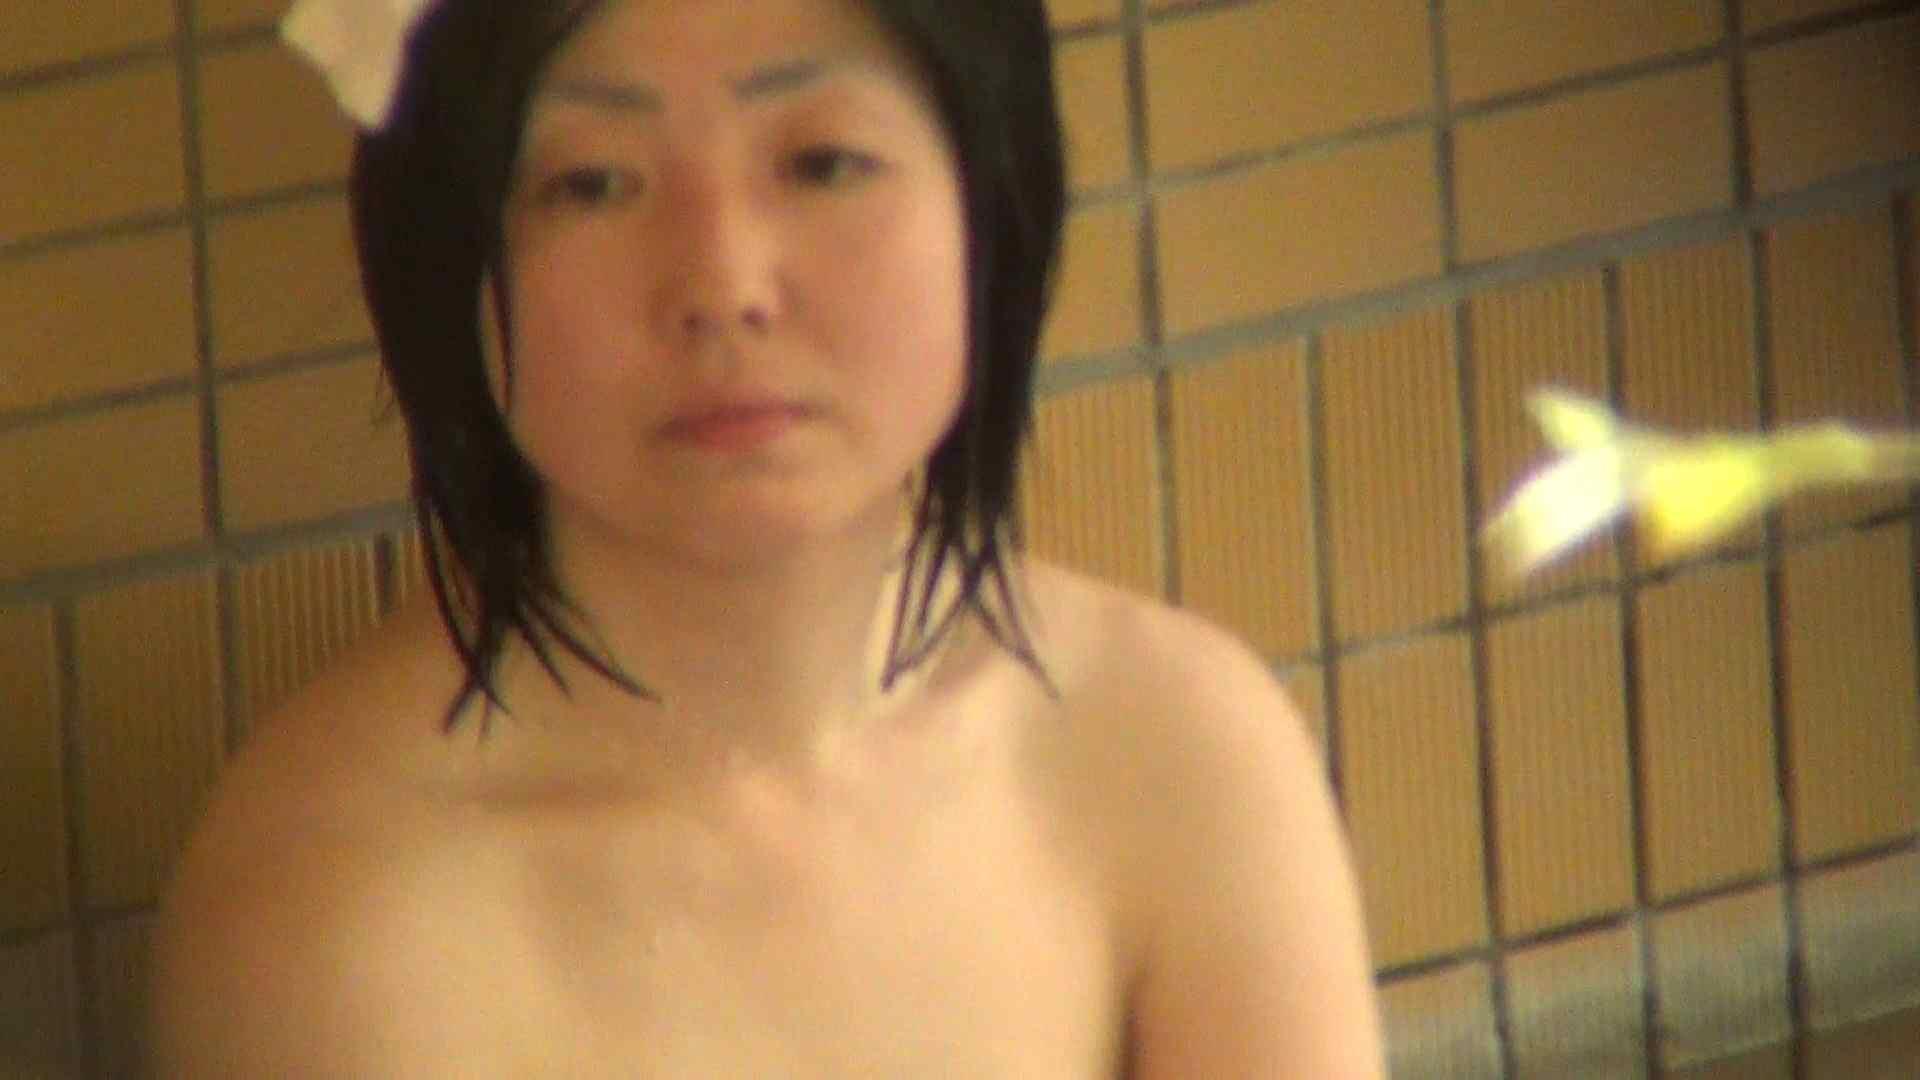 Aquaな露天風呂Vol.313 盗撮映像  33Pix 33